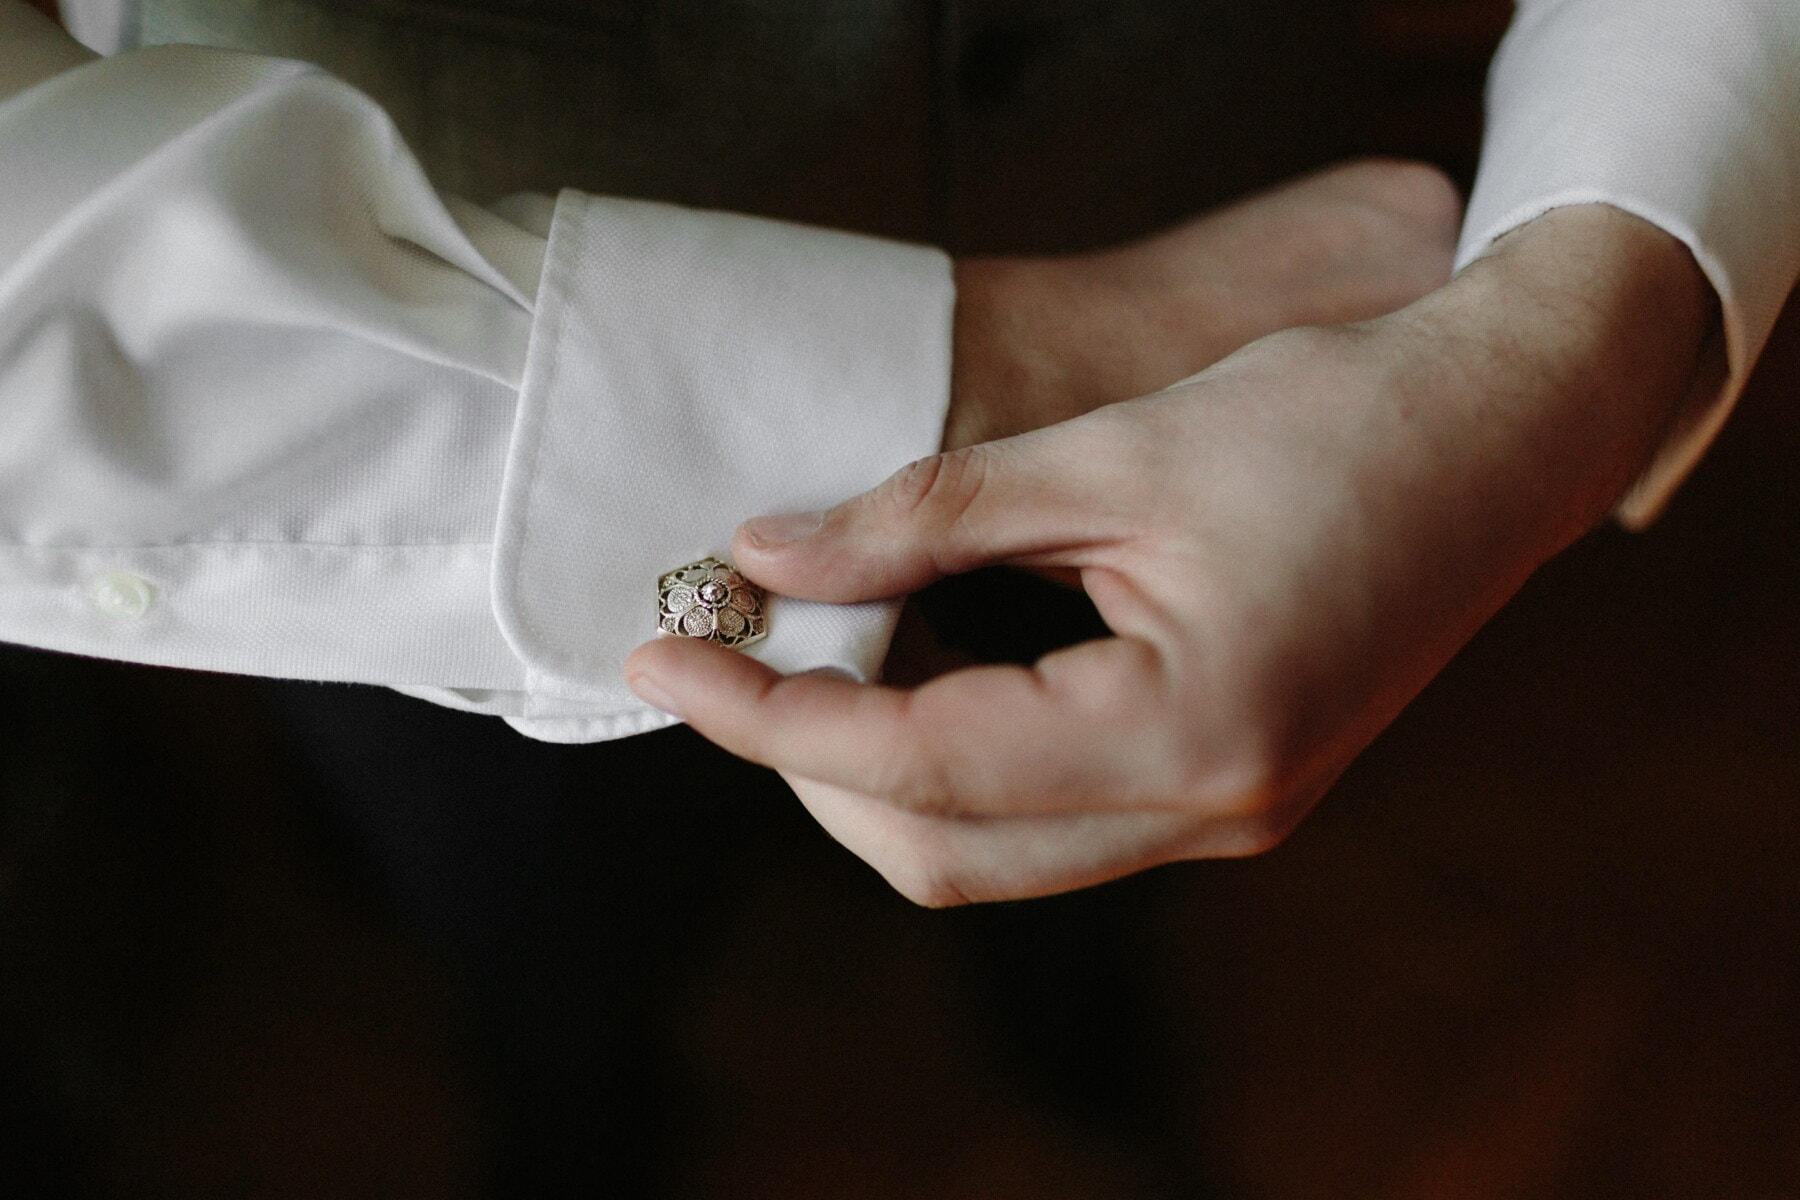 manchette, manche, chemise blanche, bouton, luxe, bijoux, mode, mains, homme, main